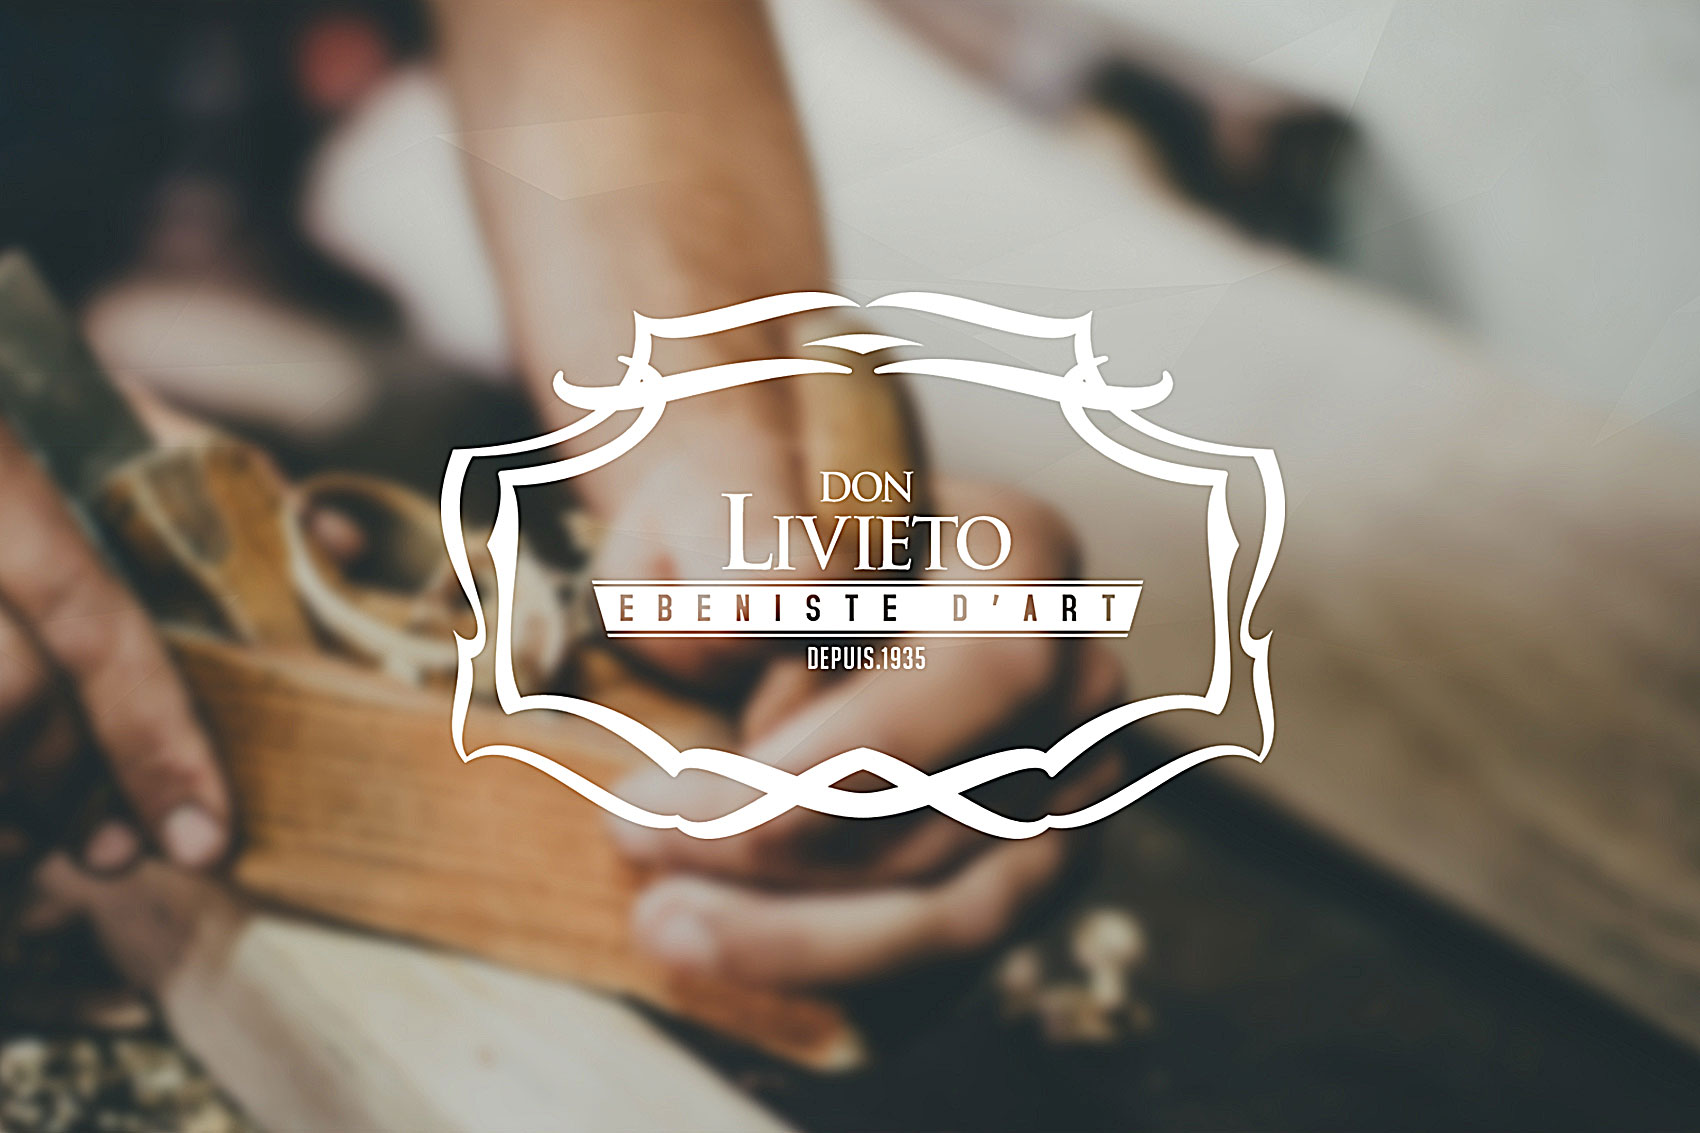 Création logo et charte graphique logo Don Livieto